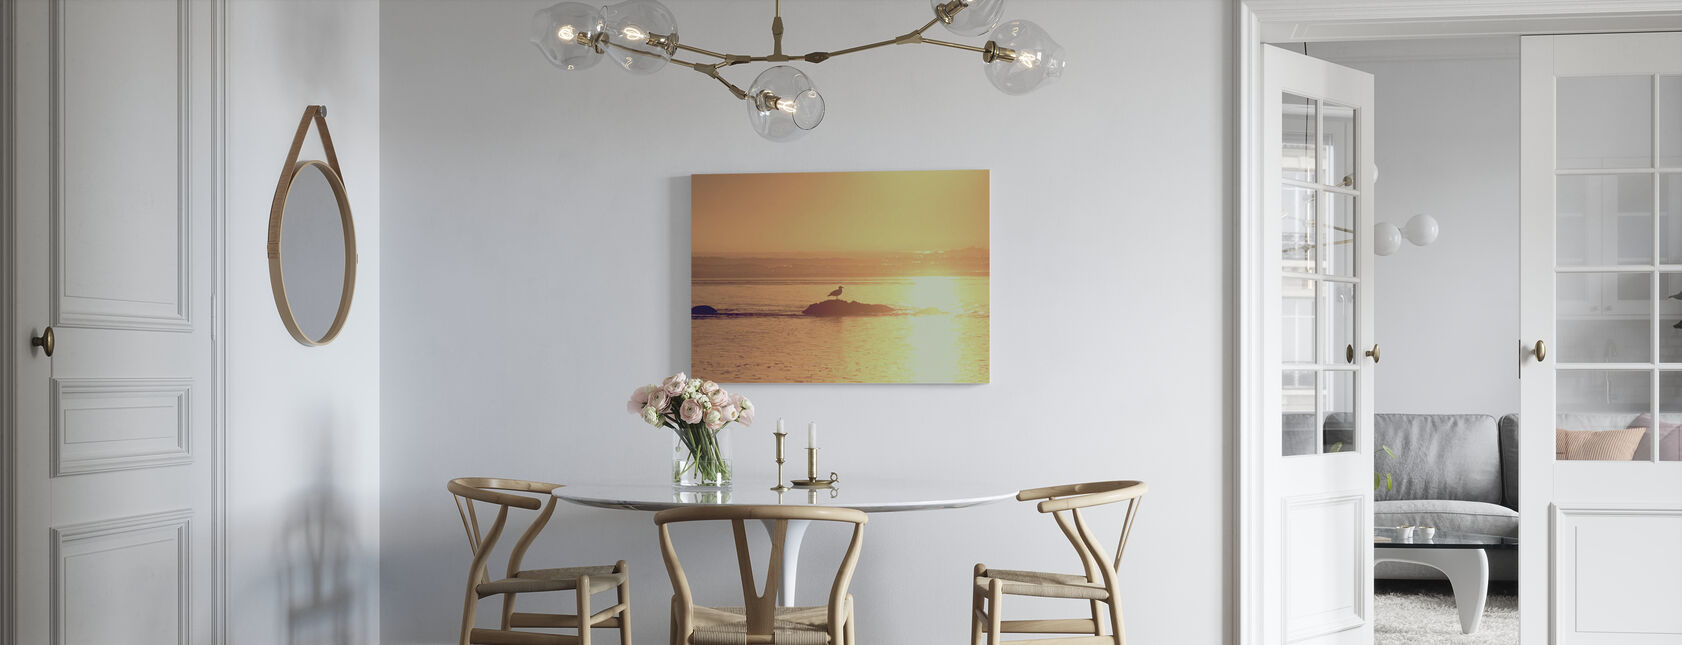 Kalaloch Zonsondergang - Canvas print - Keuken